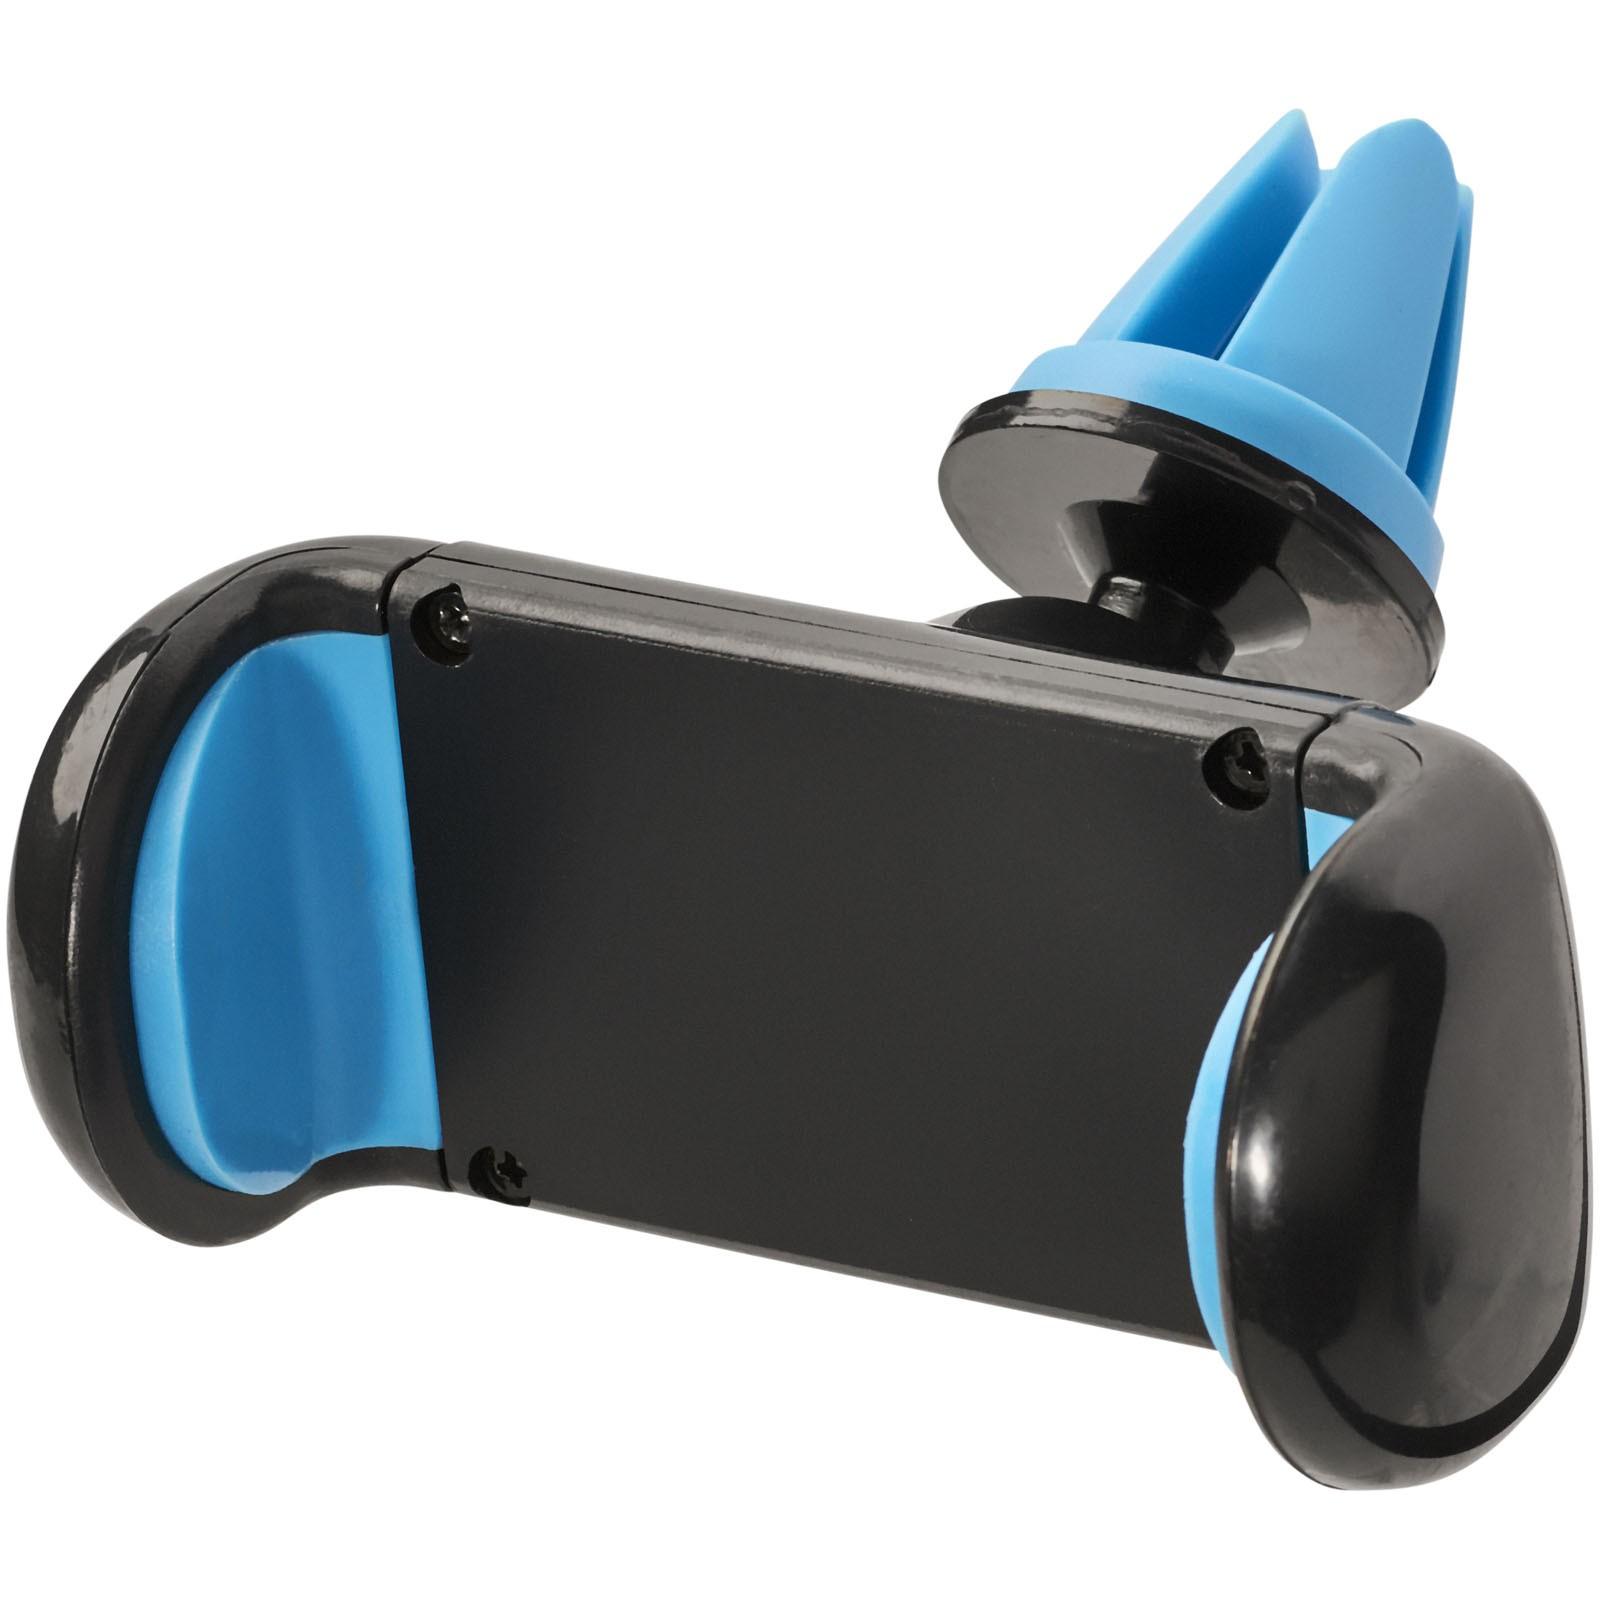 Grip držák telefonu do auta - Světle modrá